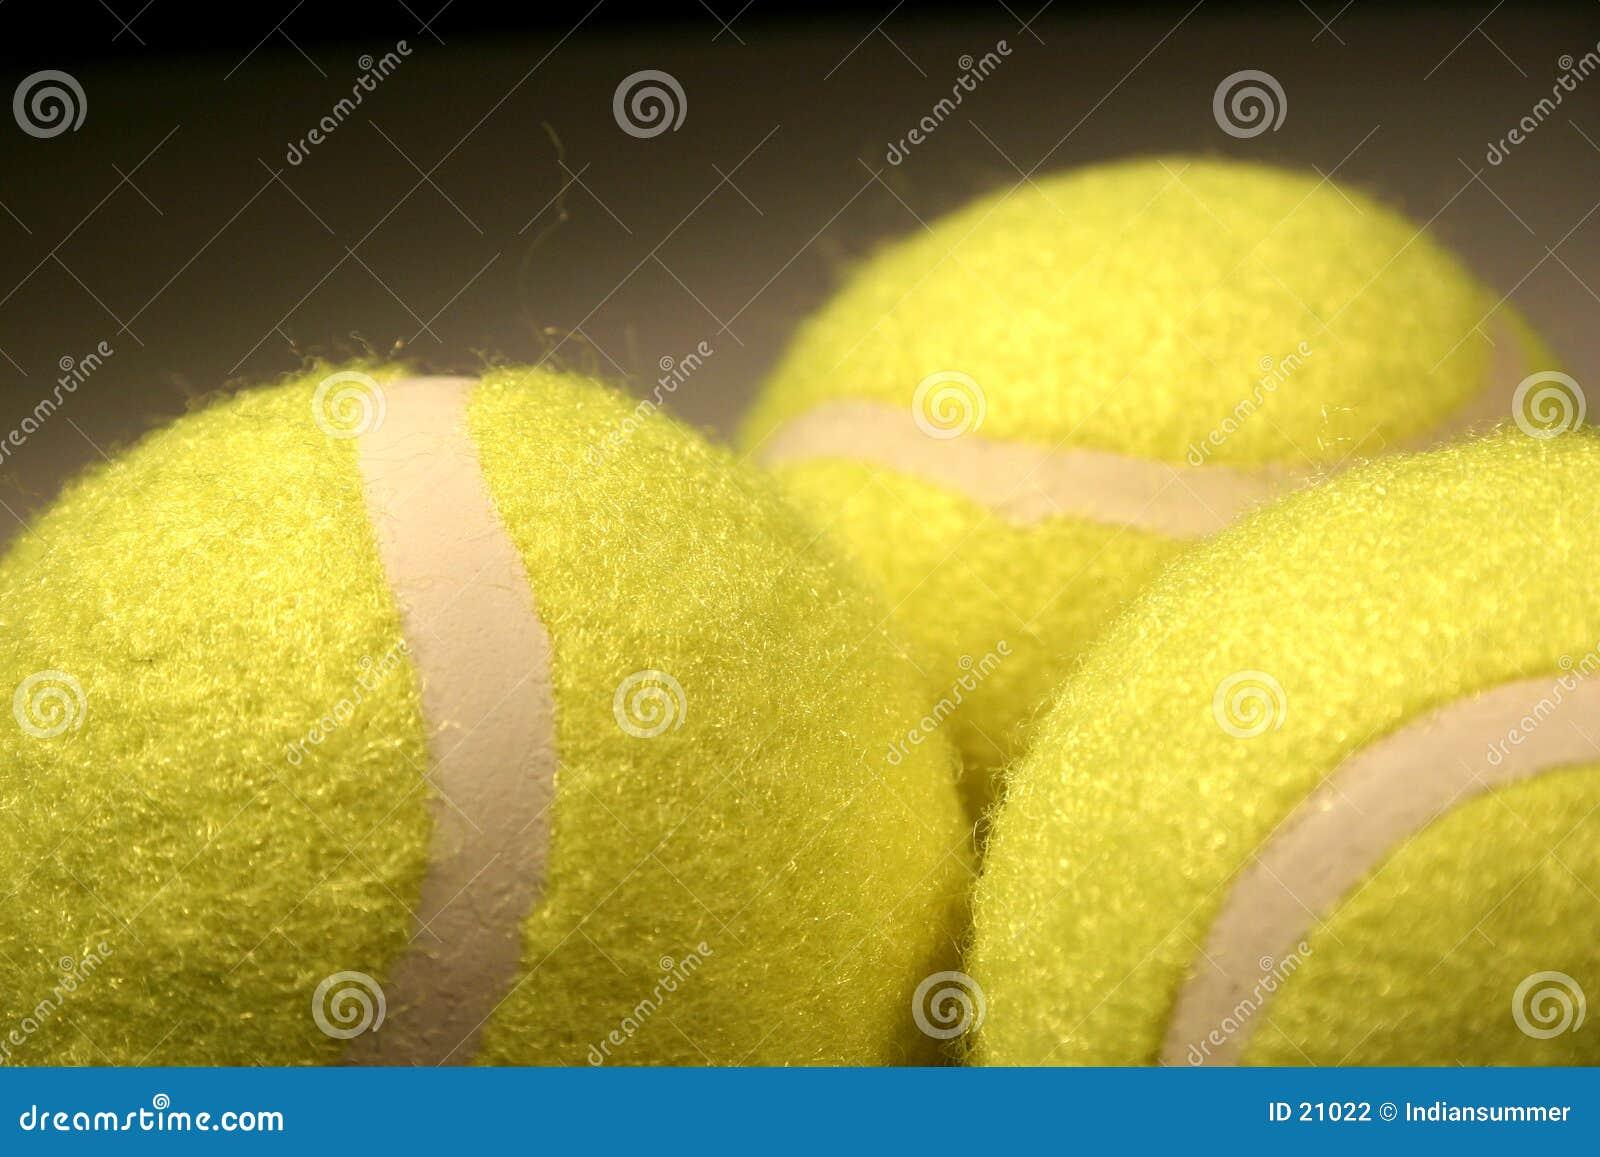 球iii网球三